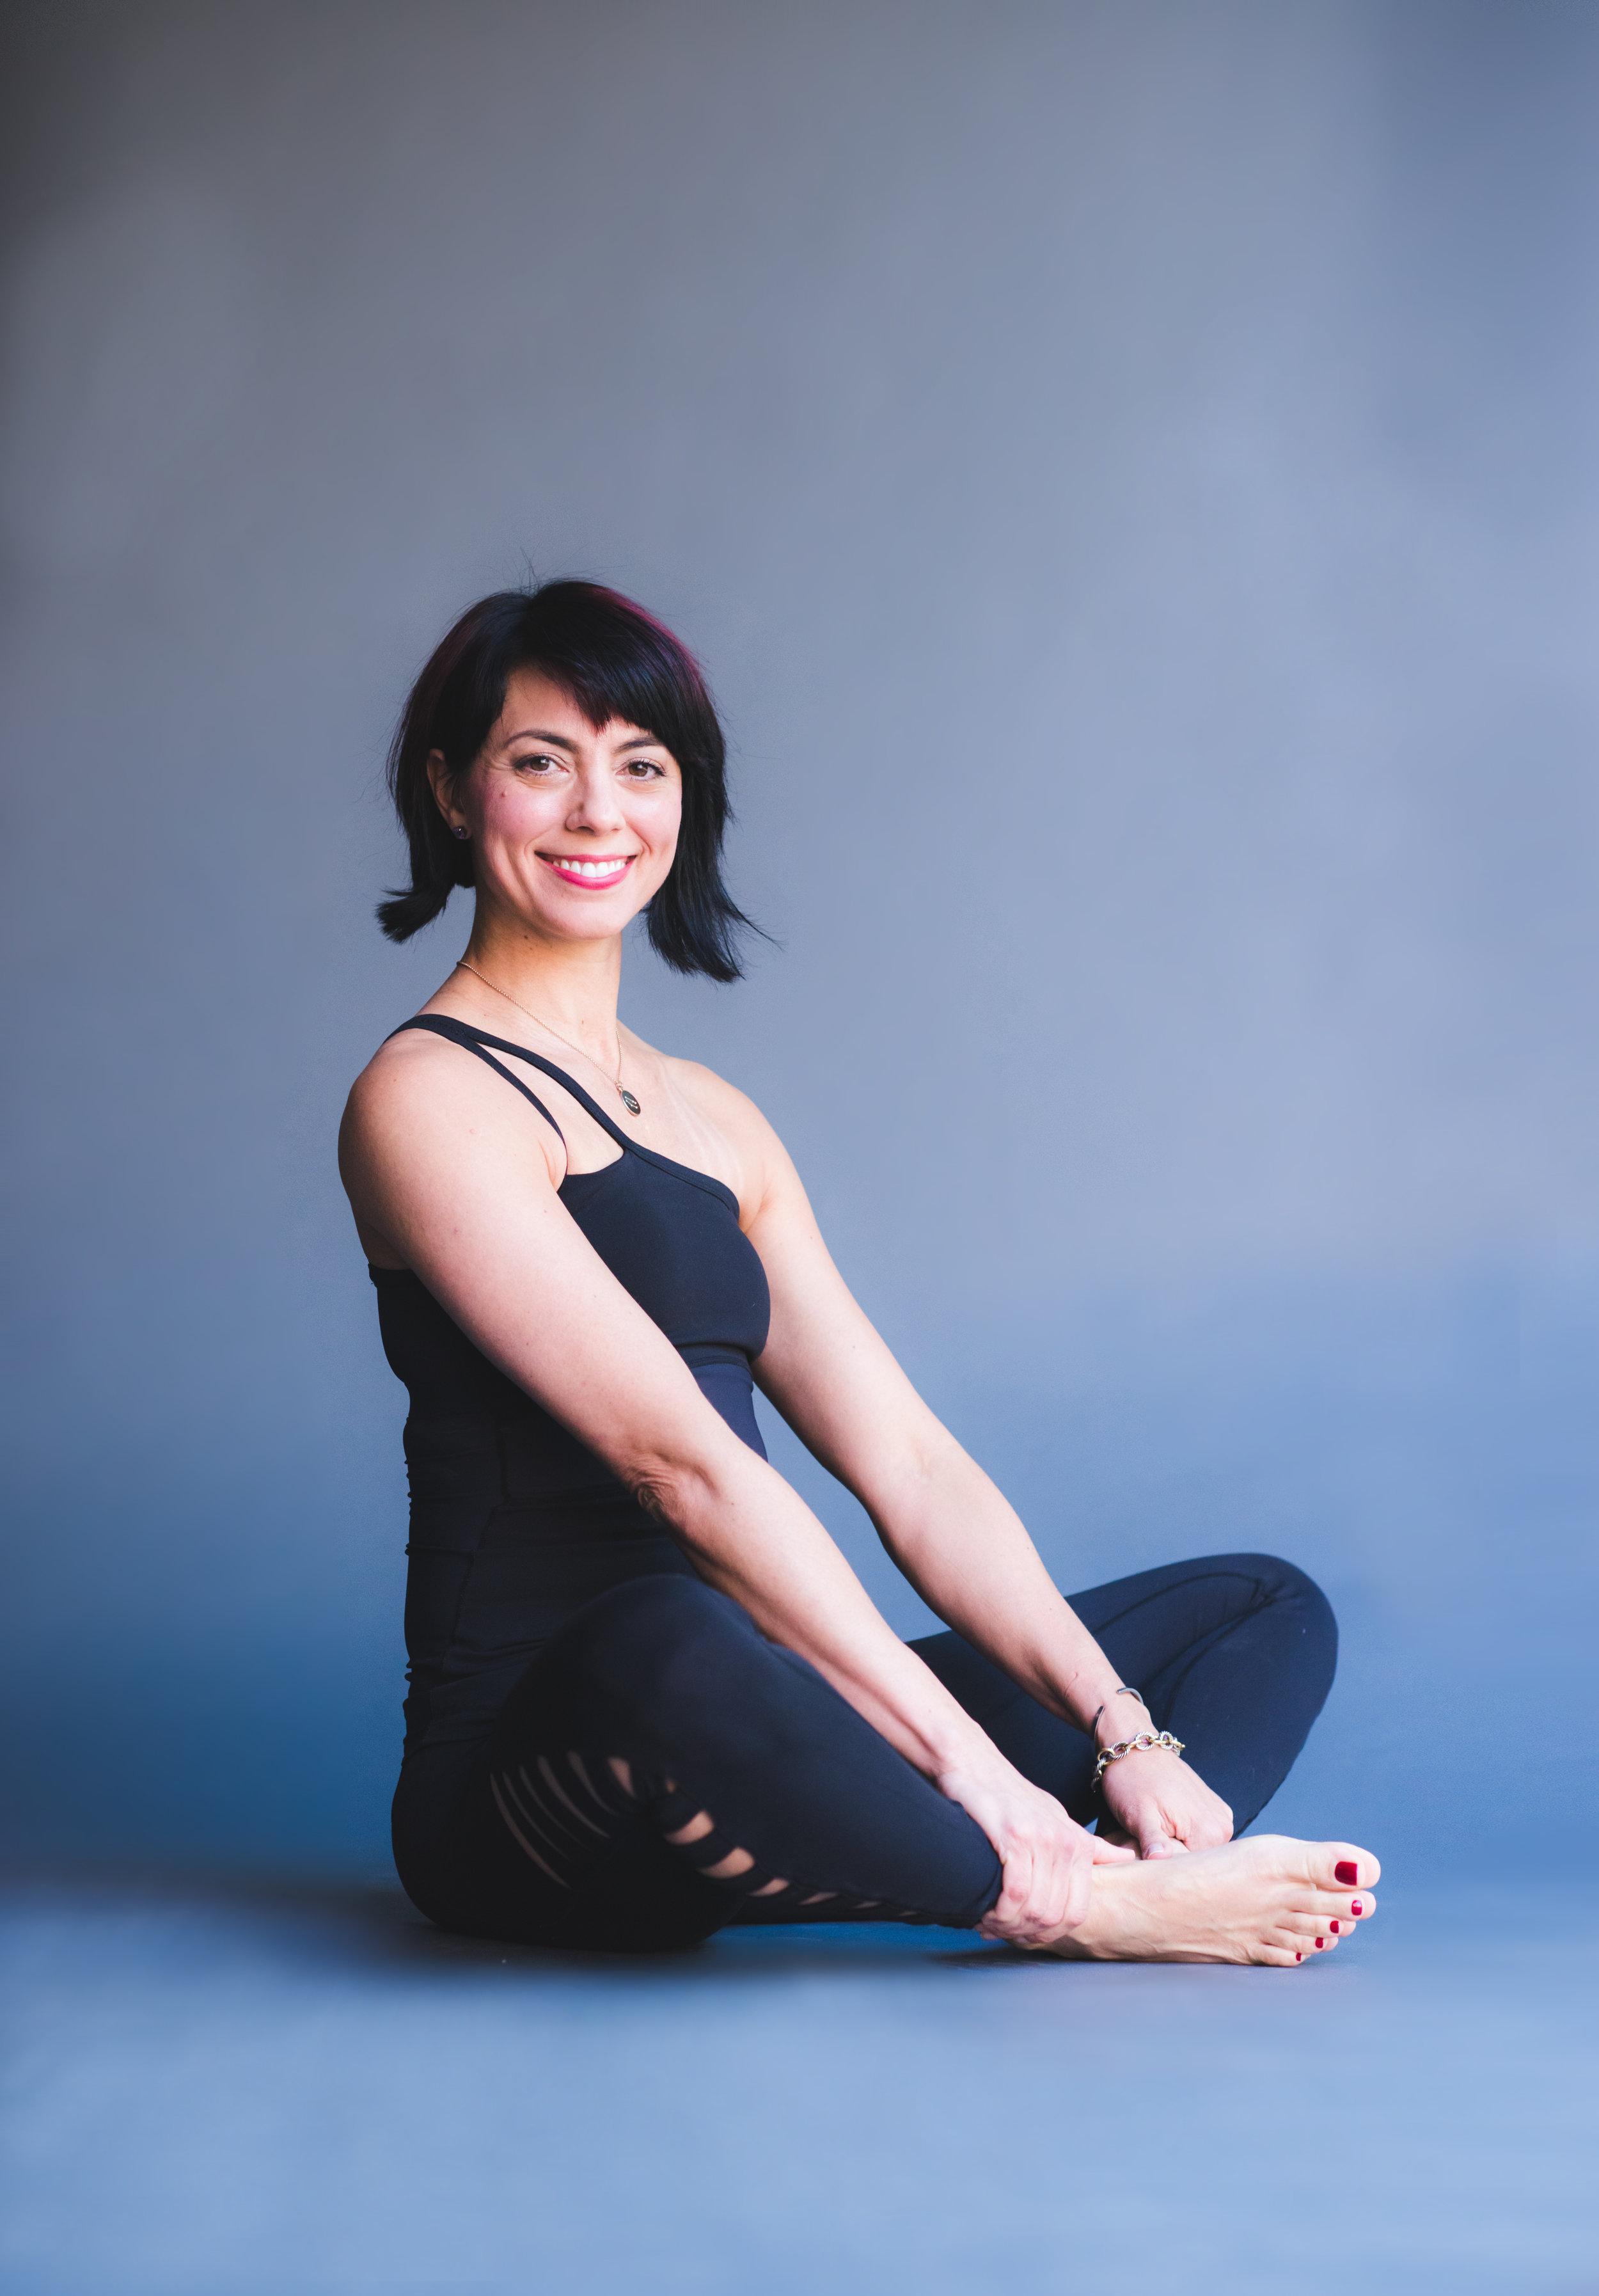 Valerie Knopik